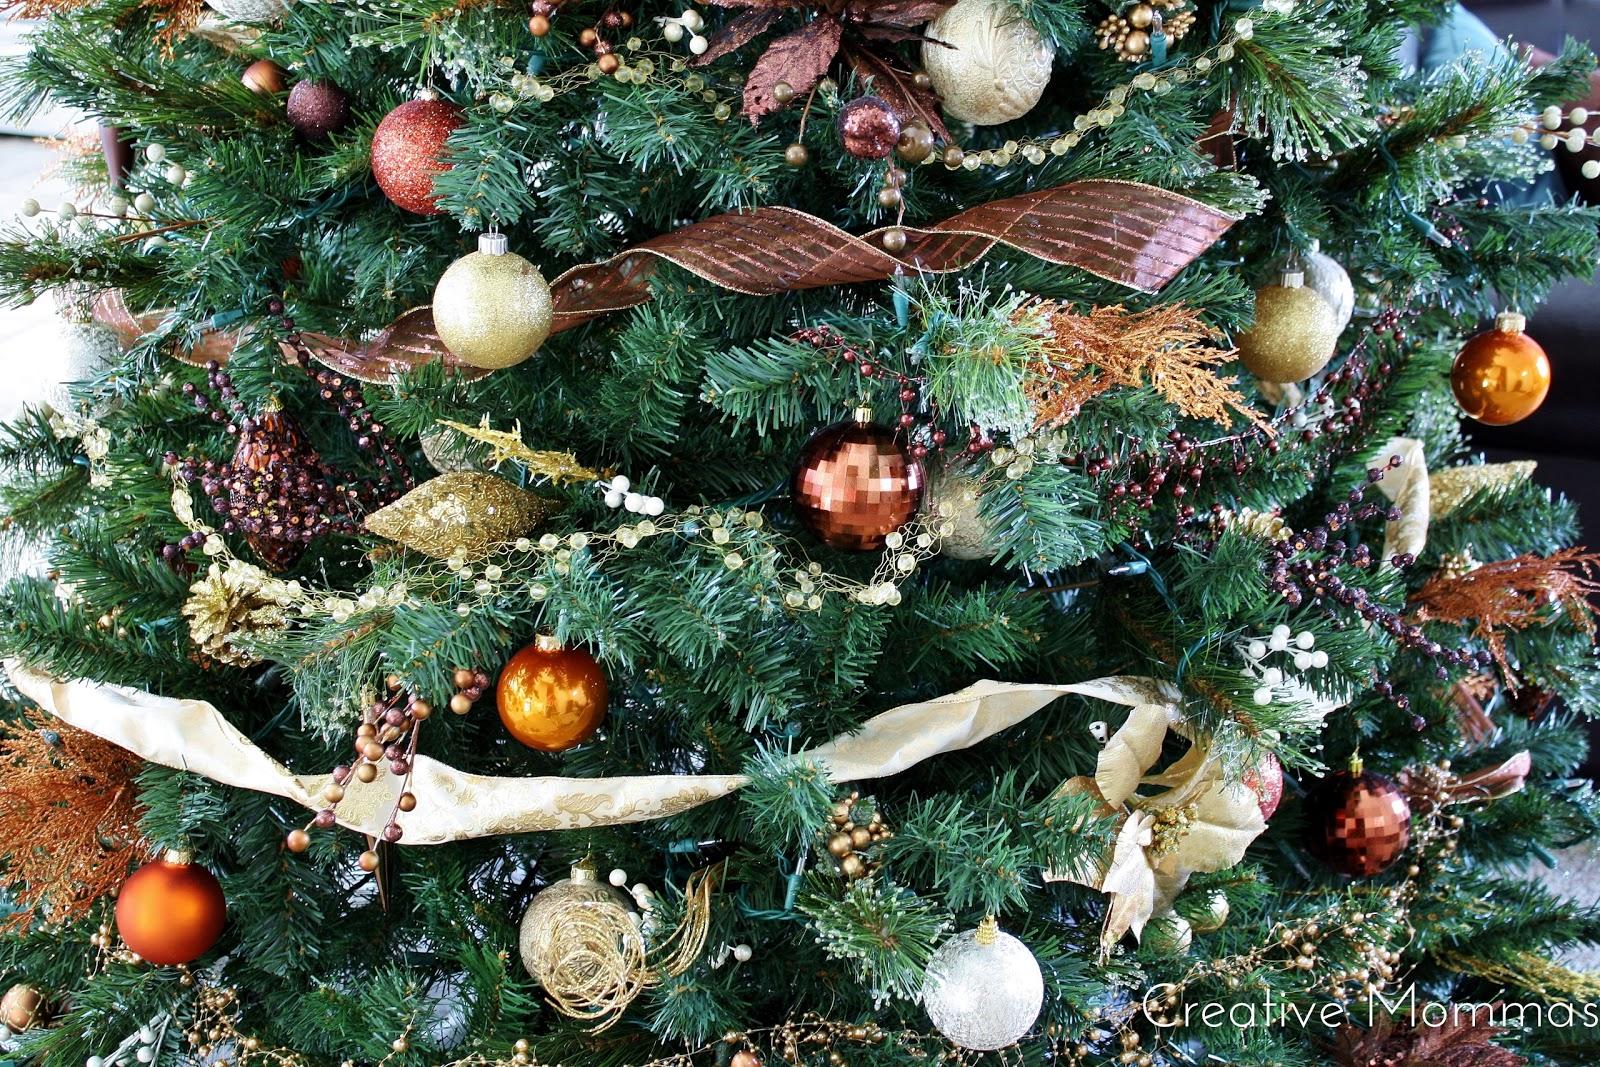 Creative Mommas: 2013 Christmas Tree in the Alba Home